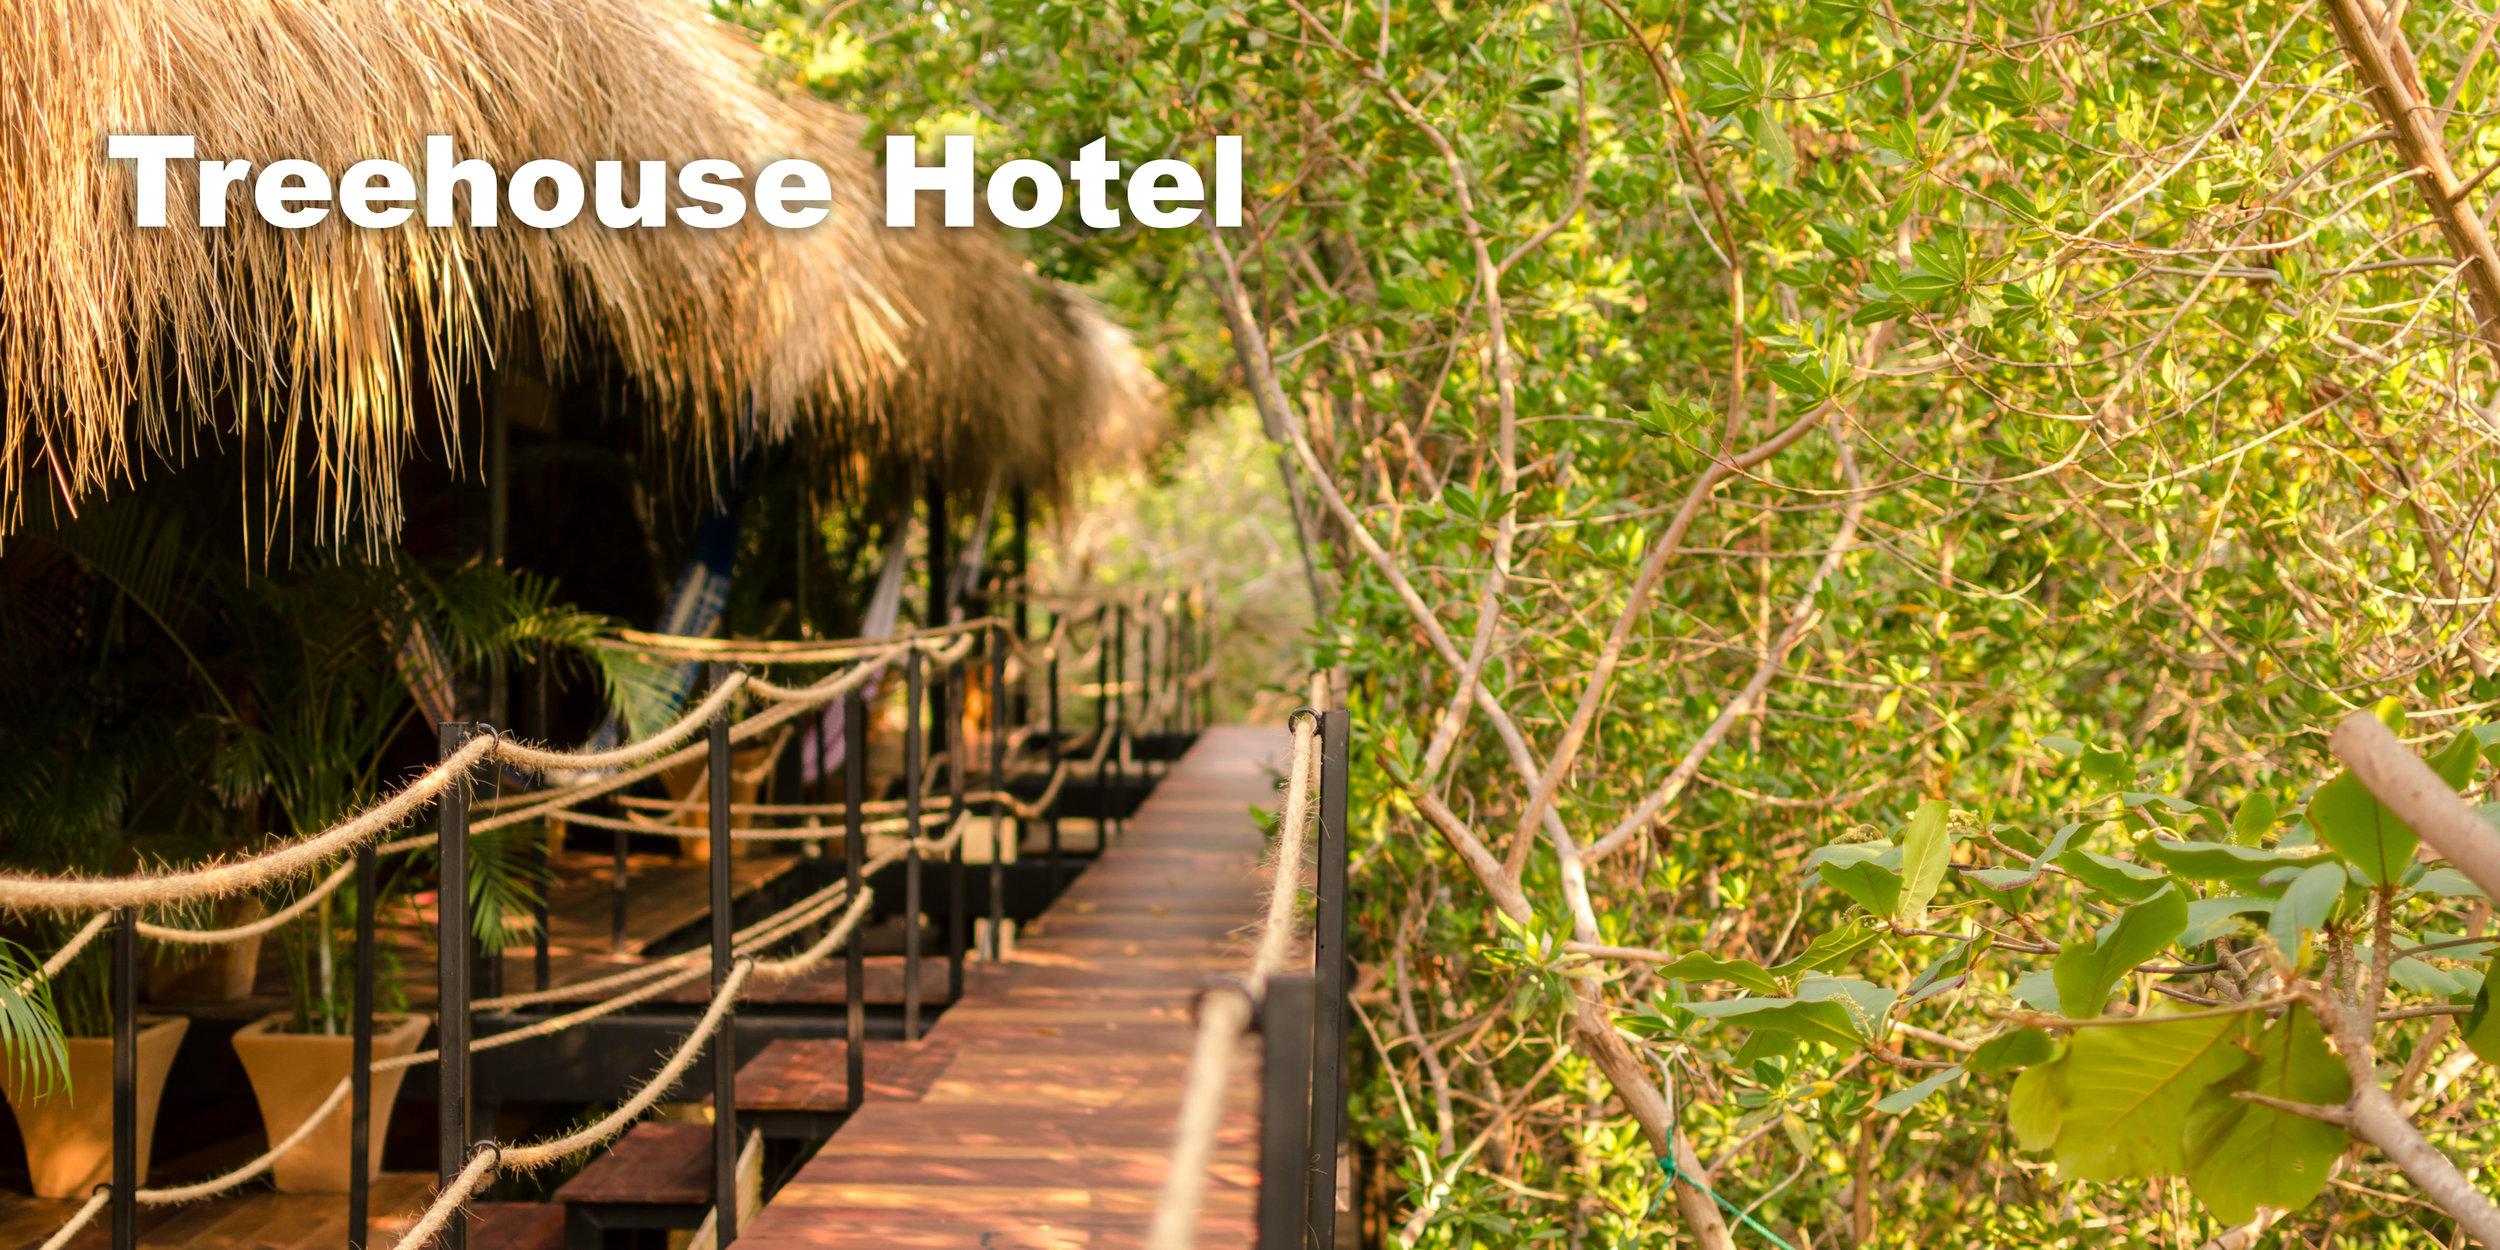 treehouse hotel.jpg